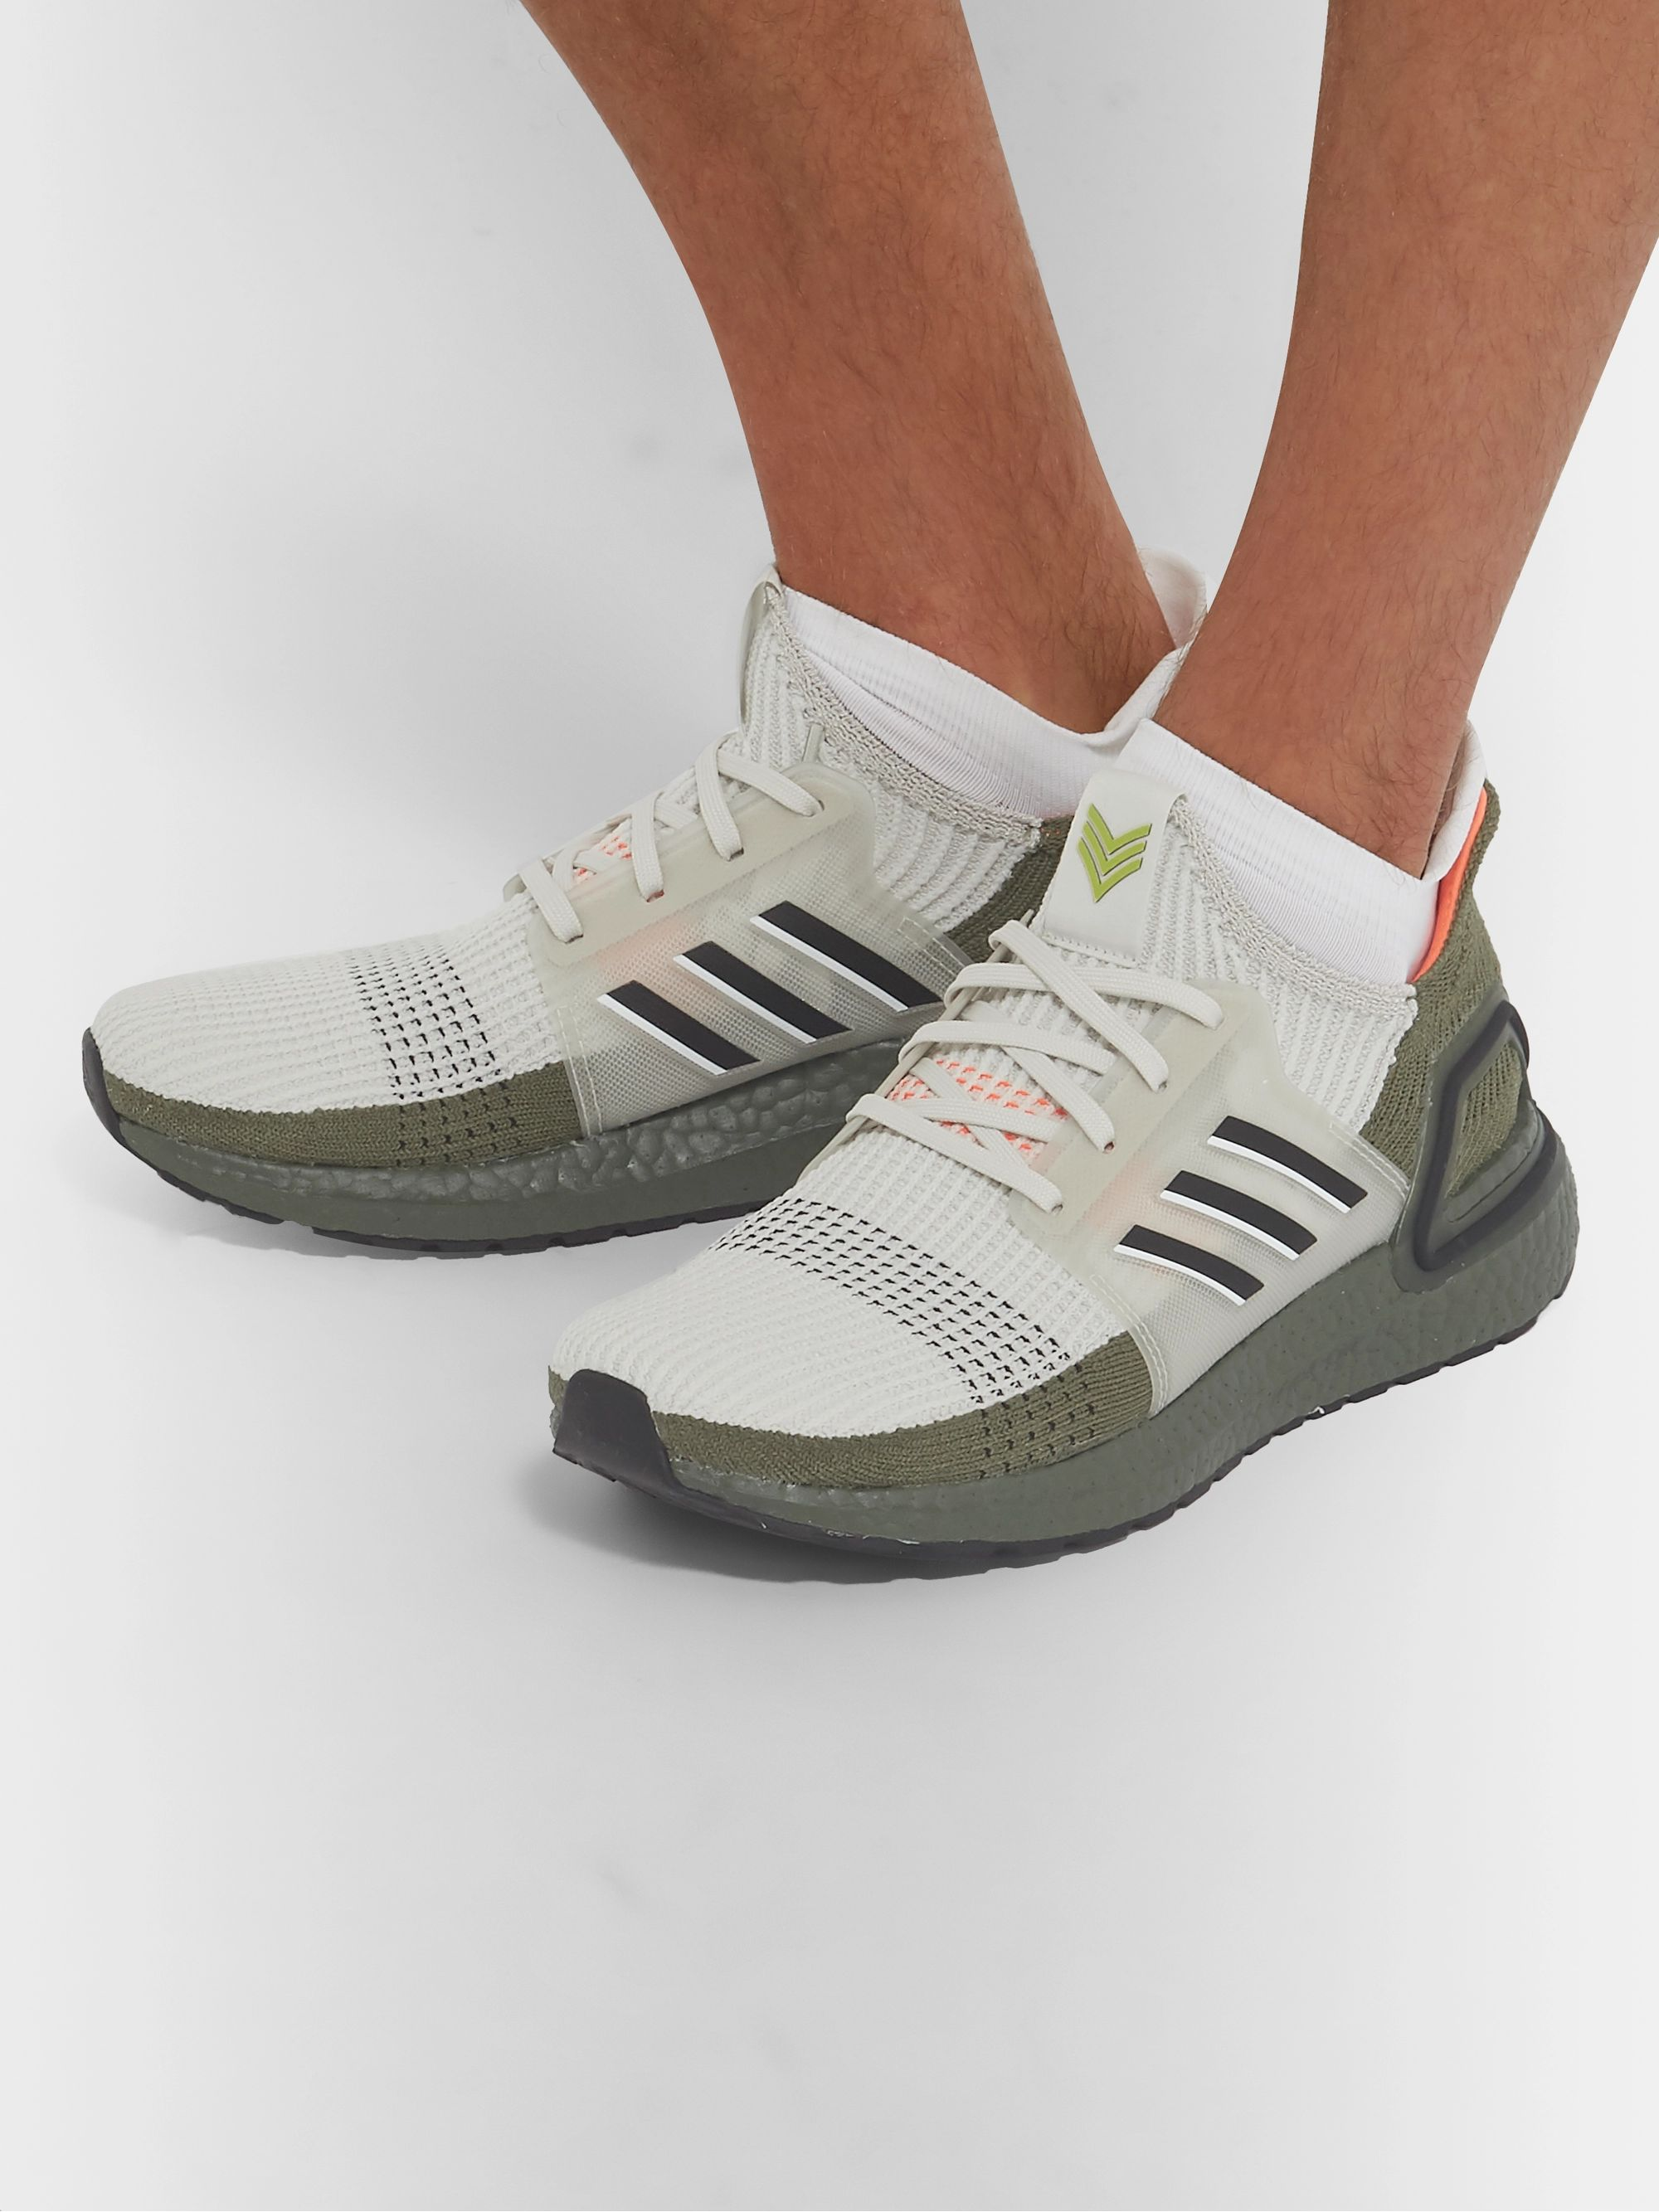 adidas Running Ultraboost 19 in gray